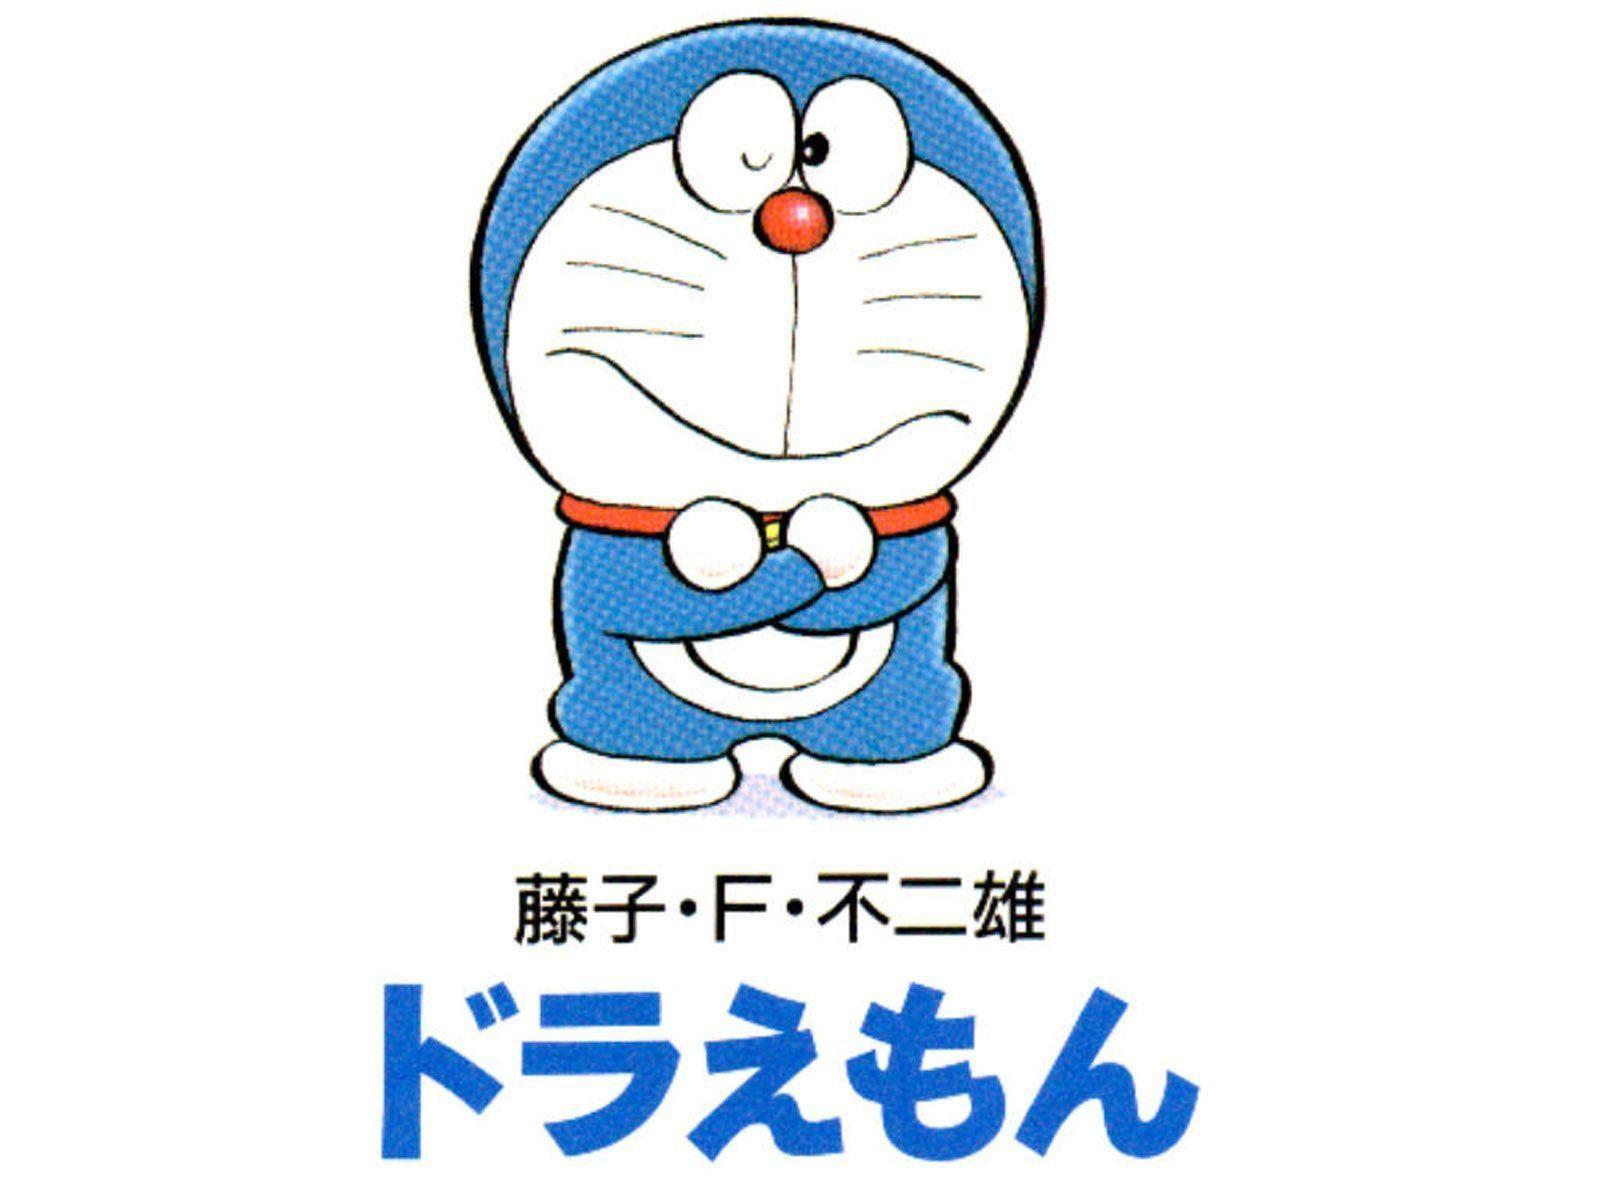 Doraemon Doraemon Wallpaper Wallpapers HD Wallpapers